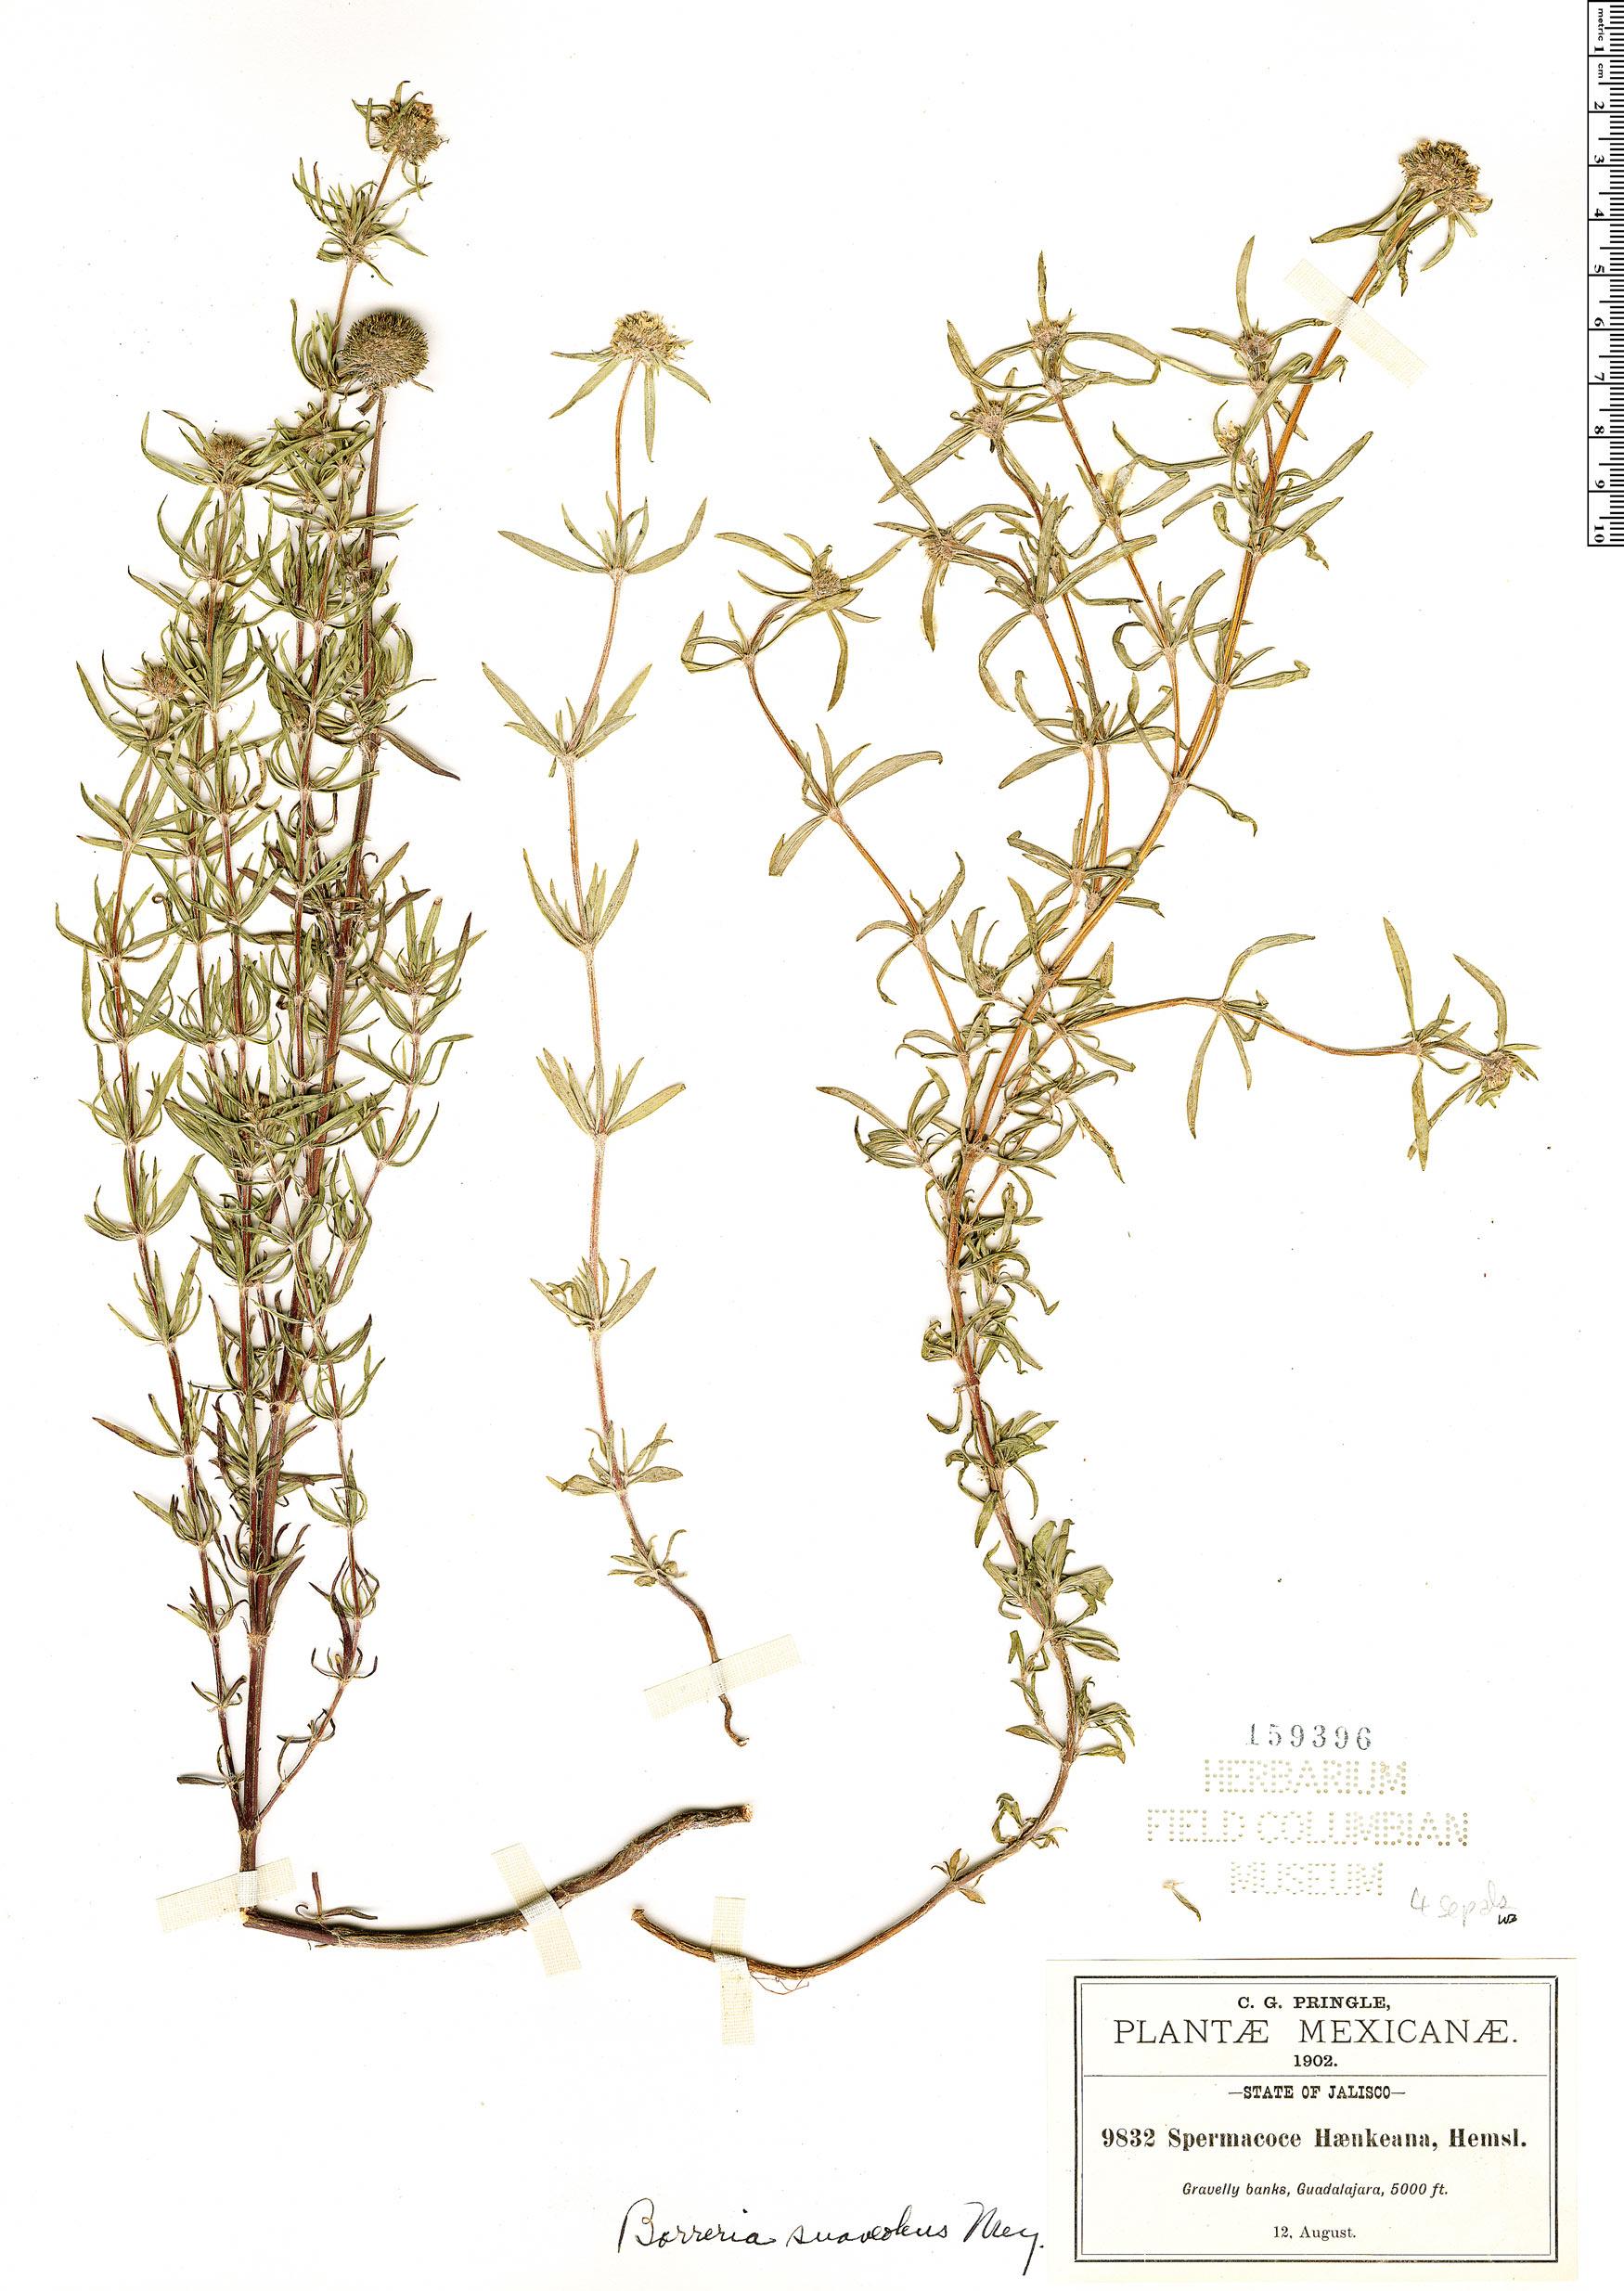 Specimen: Borreria suaveolens